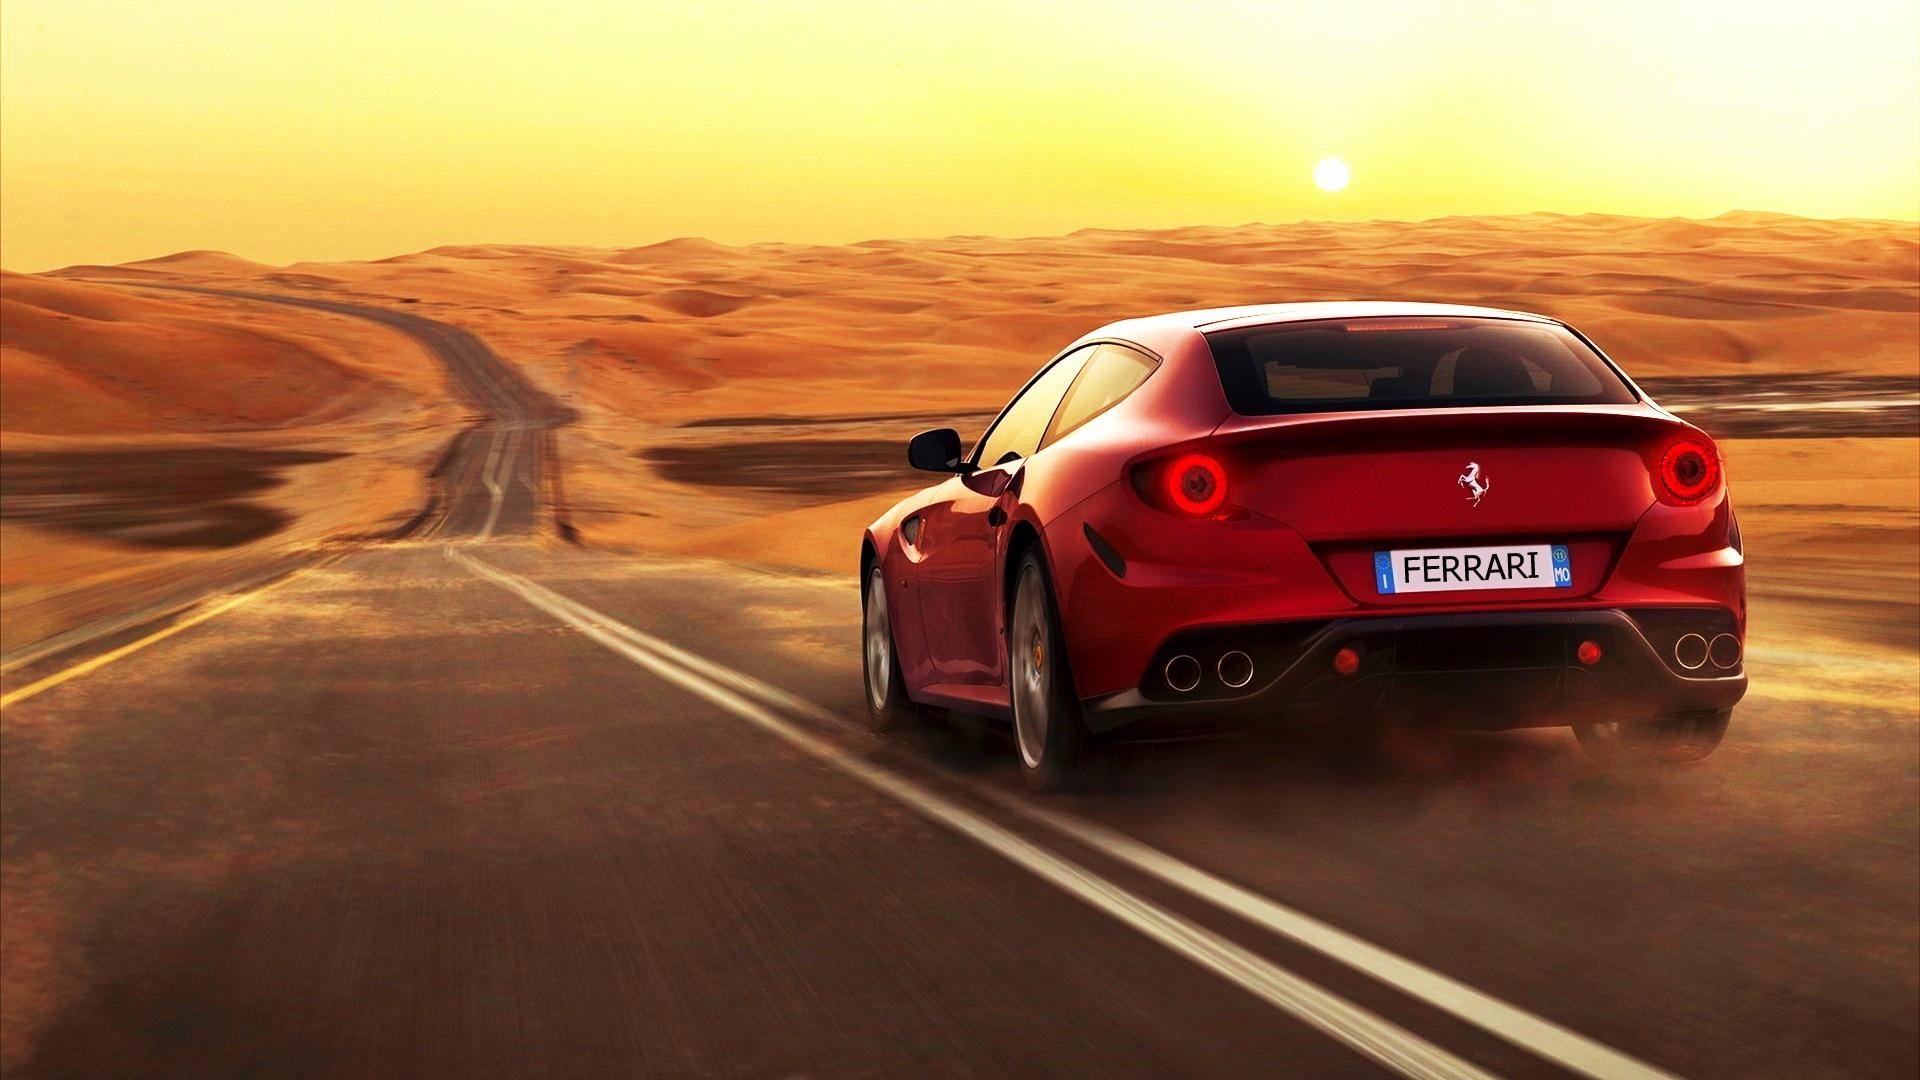 Ferrari Wallpaper 2 ...